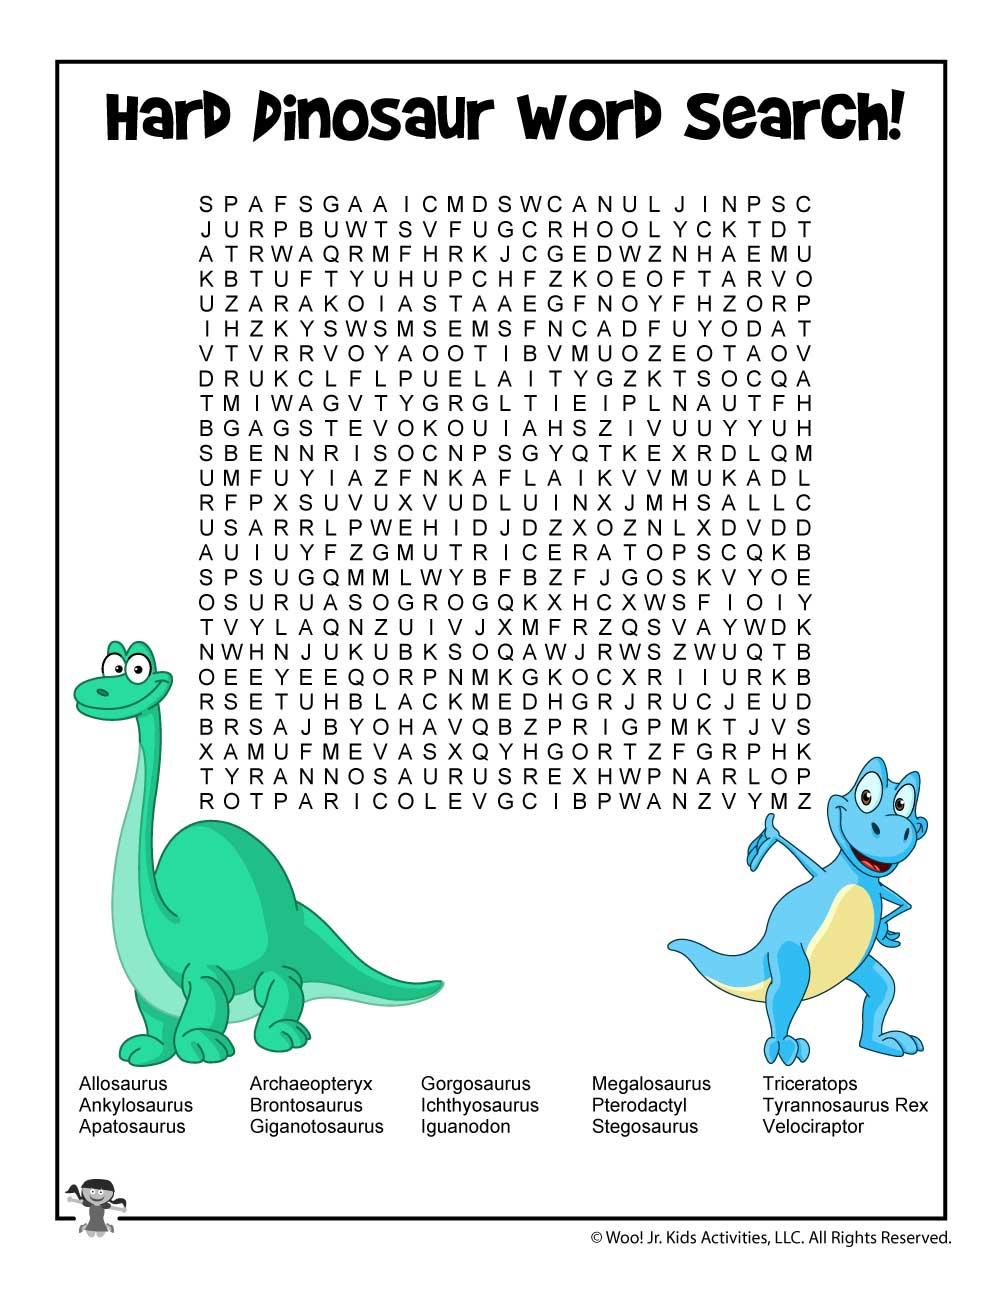 Dinosaur Word Search - Hard | Woo! Jr. Kids Activities